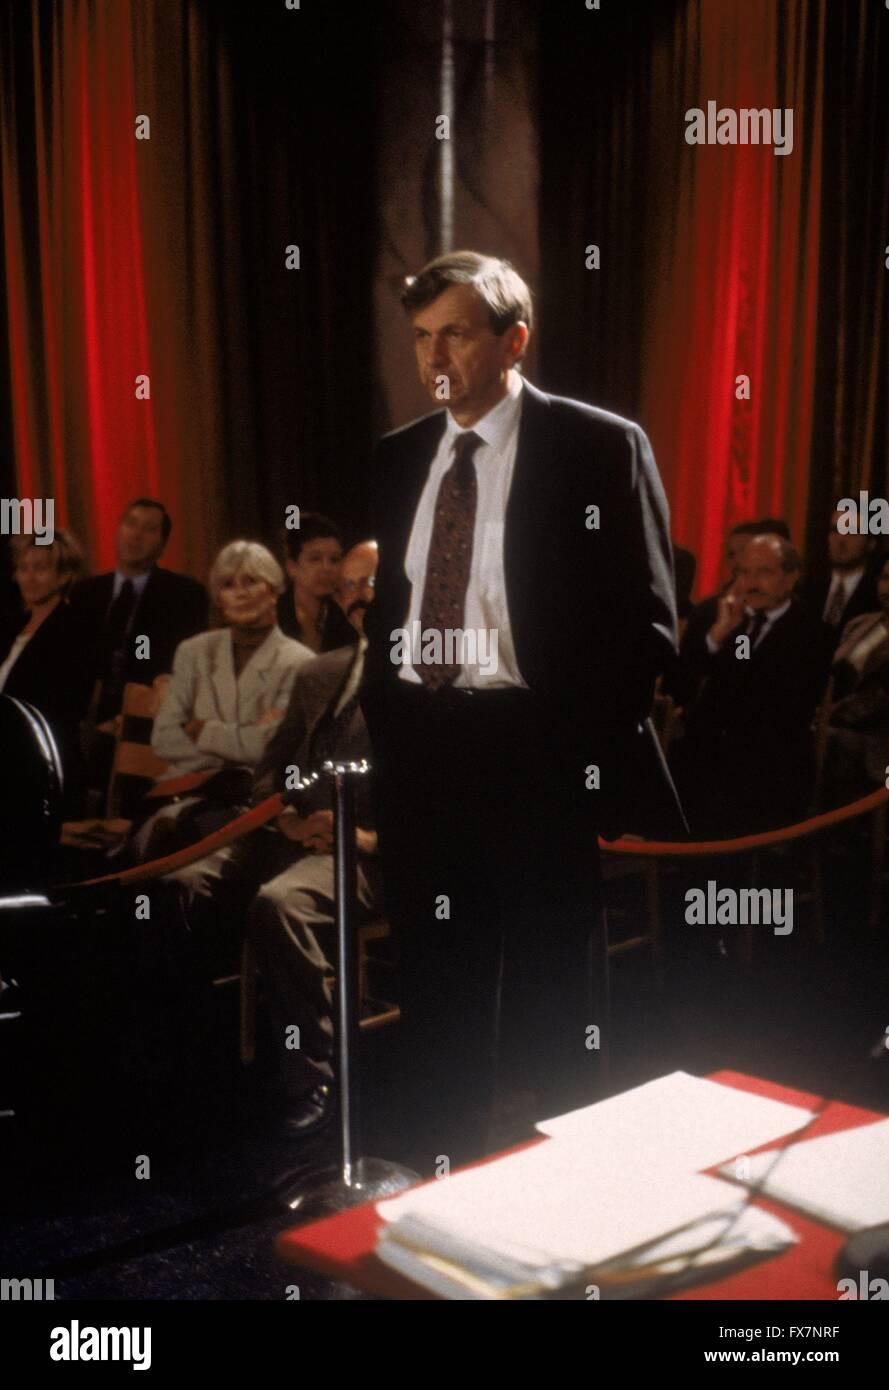 The X Files TV Series 1993 - 2002 USA 1996 Season 4 Created by Chris Carter William B. Davis - Stock Image